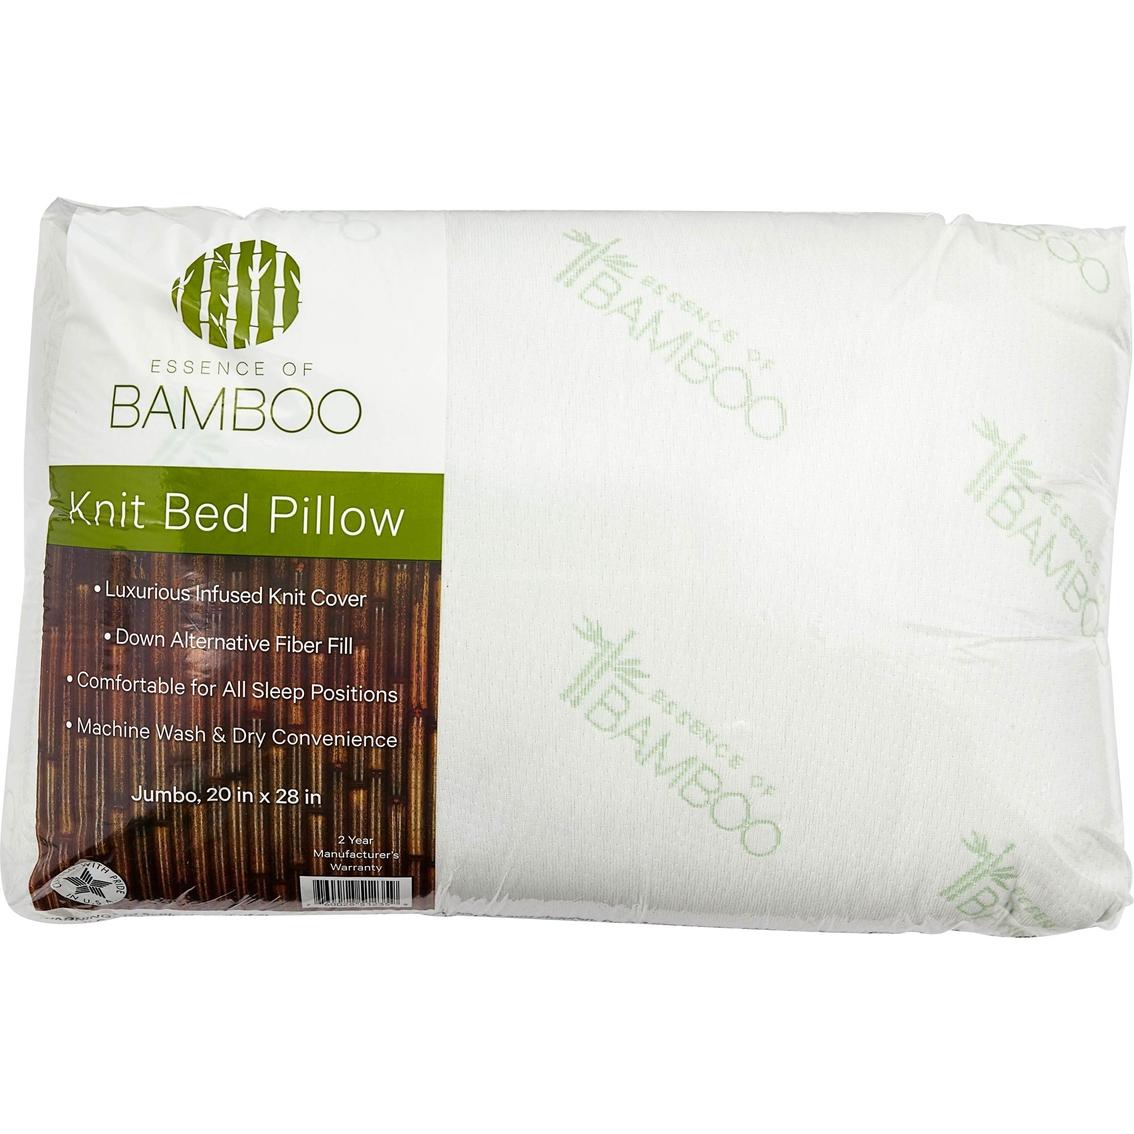 essence of bamboo pillow online